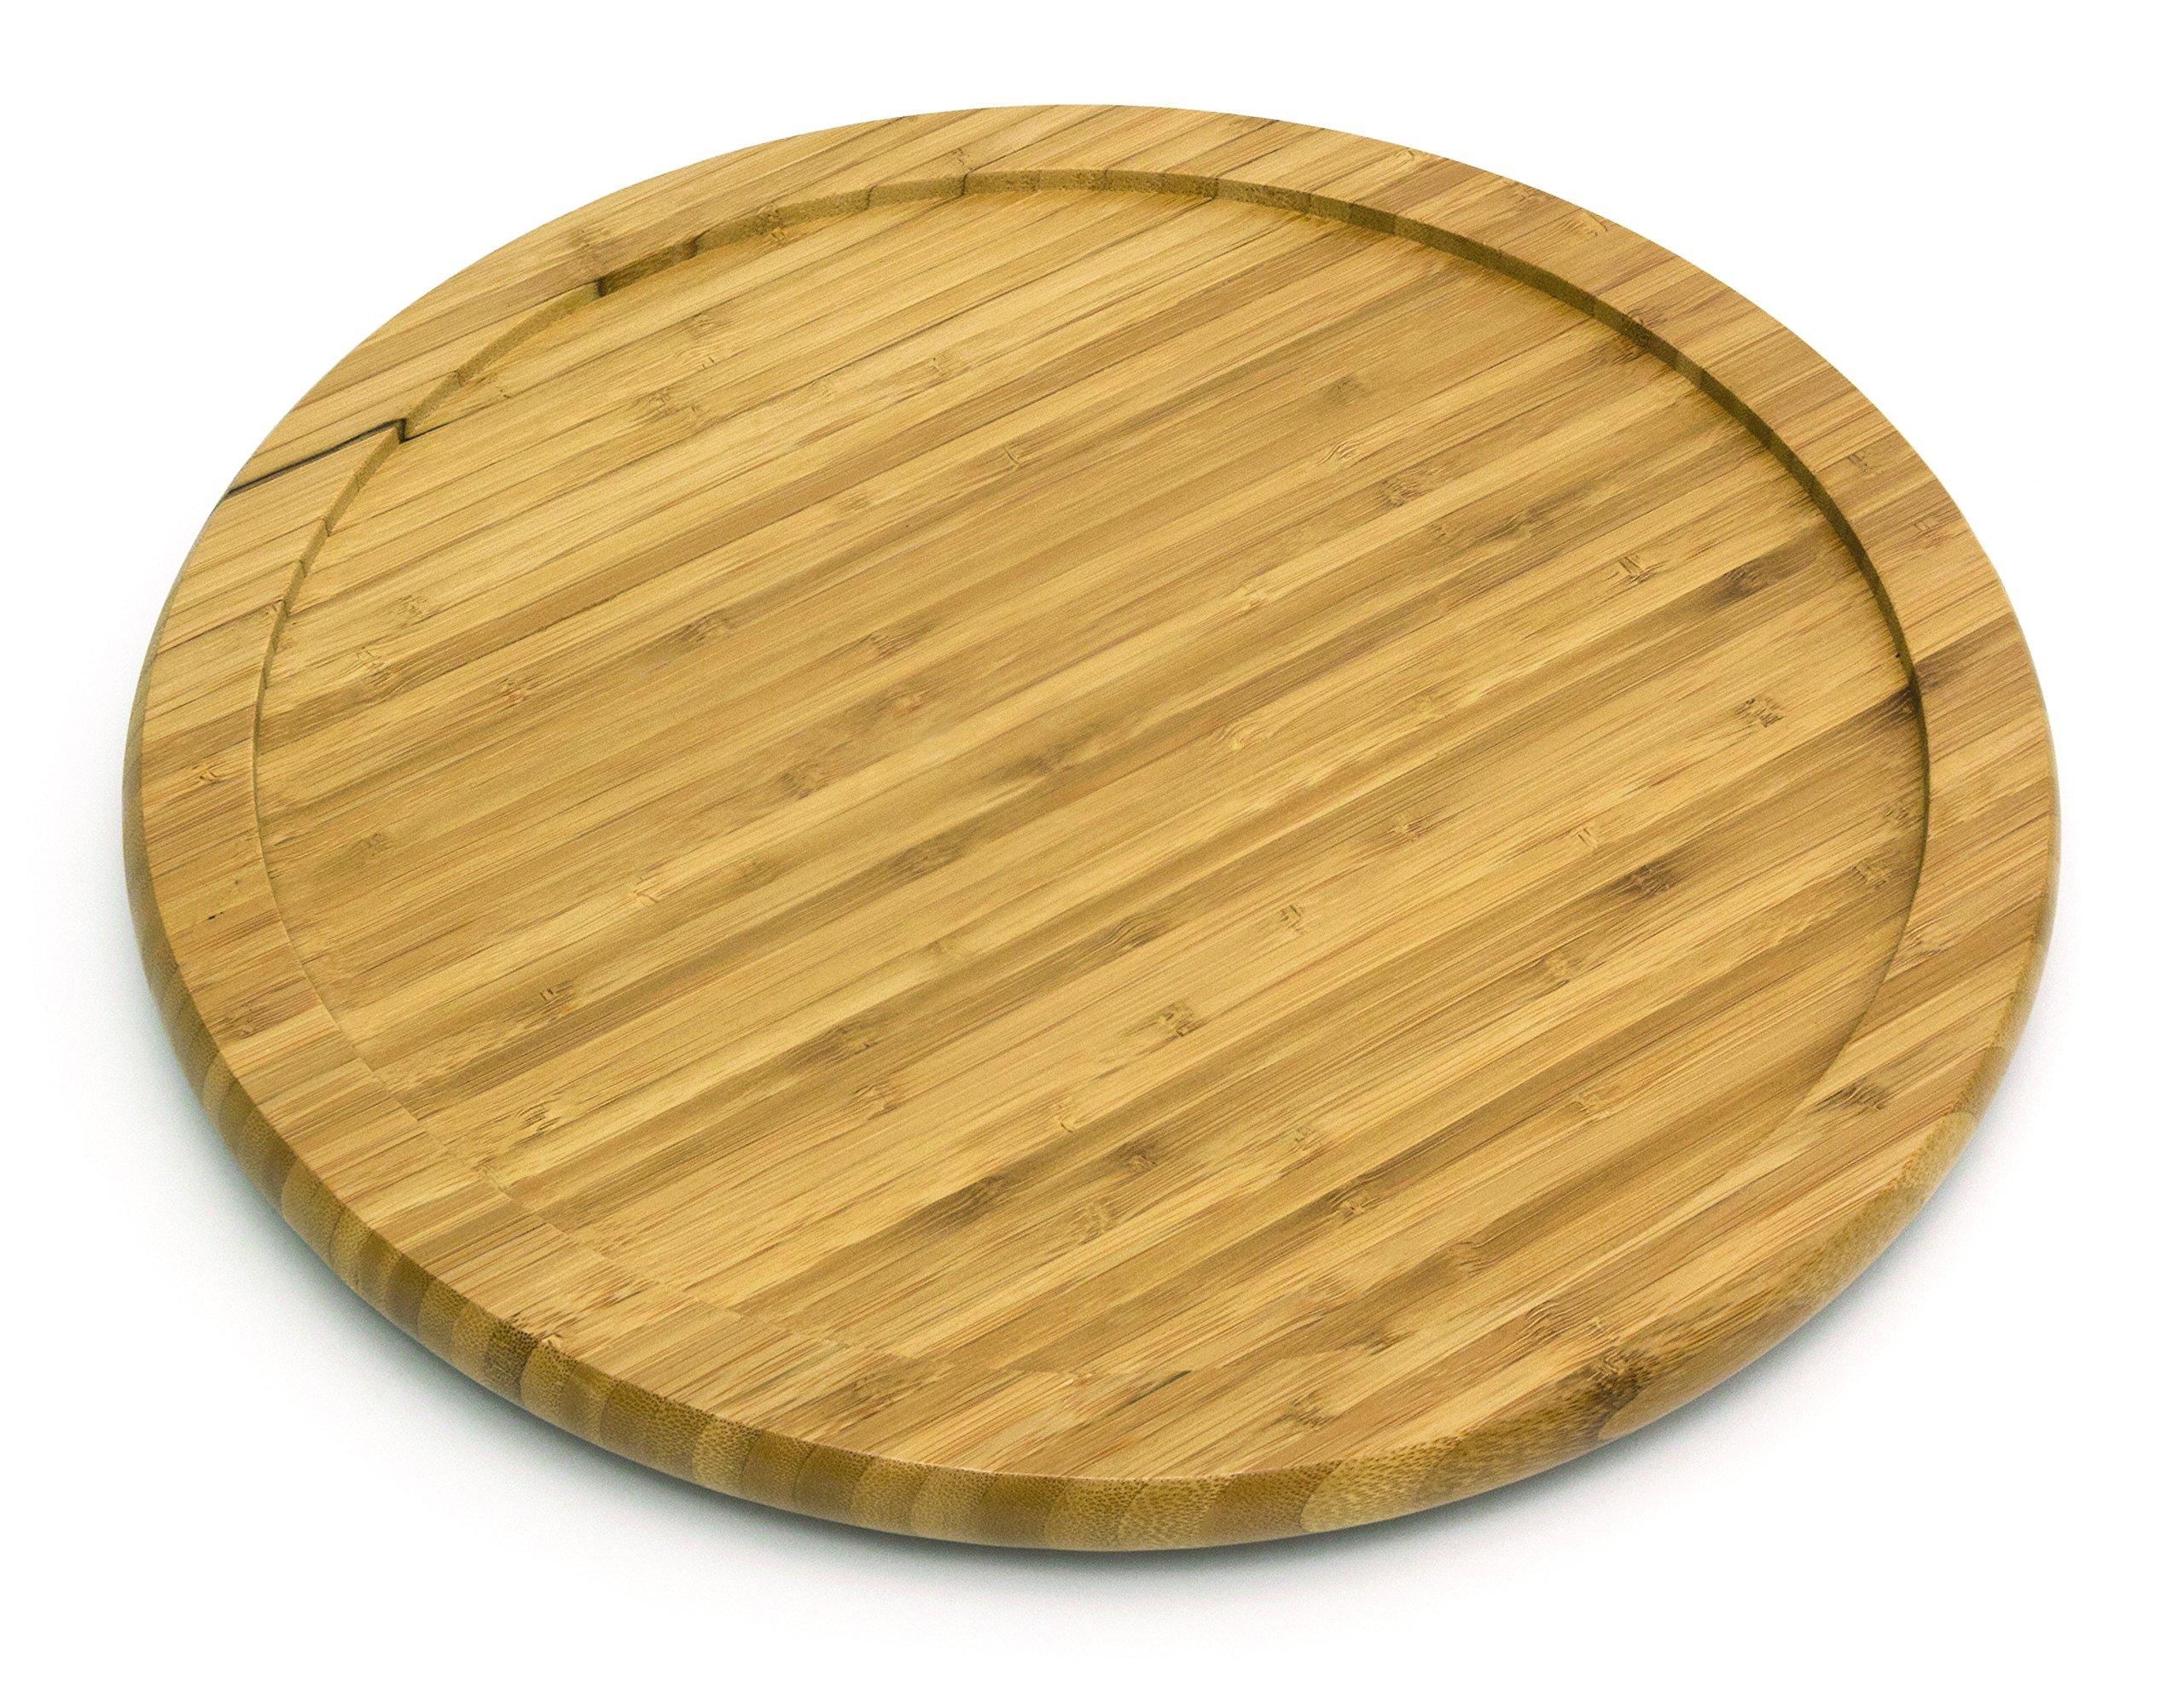 Lipper International 8304 Bamboo Wood 14'' Kitchen Turntable